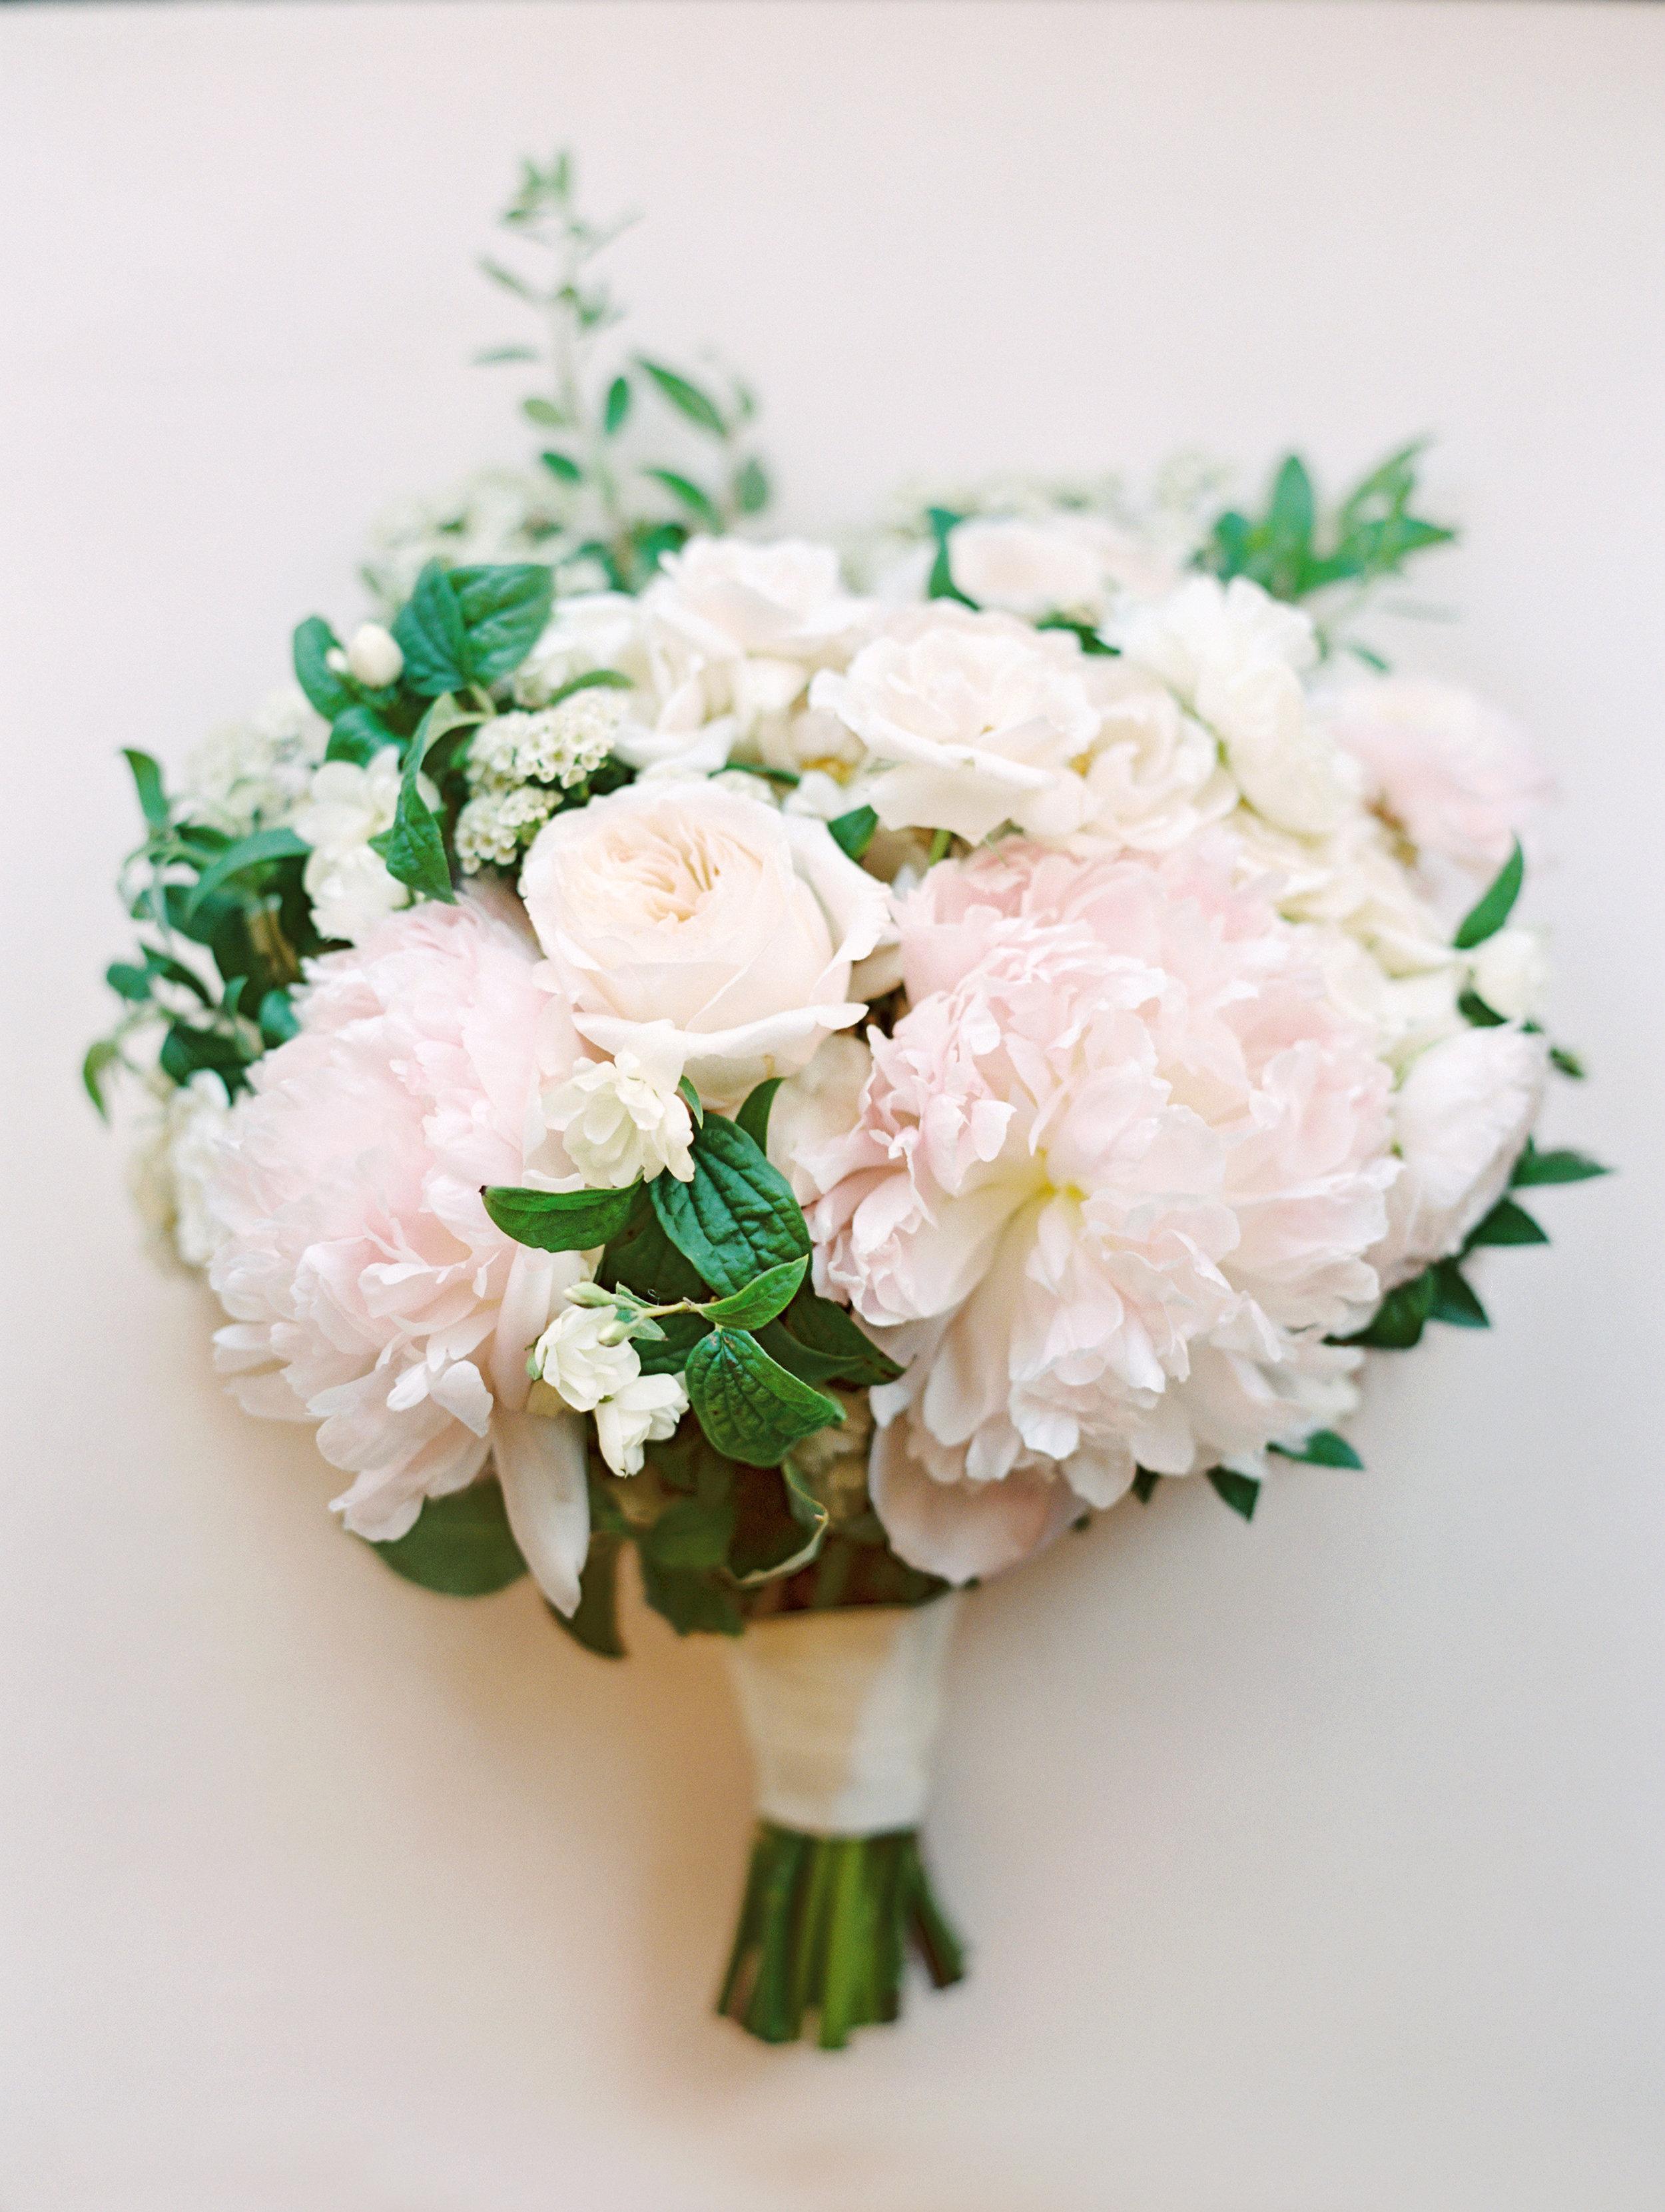 Photography -  Lavender and Twine Photography   Blush Lillian Wild Peony - Spring  Mock Orange - June Only  Spirea - Spring  Blush Eden Garden Rose - Spring/Summer/Fall  White Majolika Spray Rose - Year Round